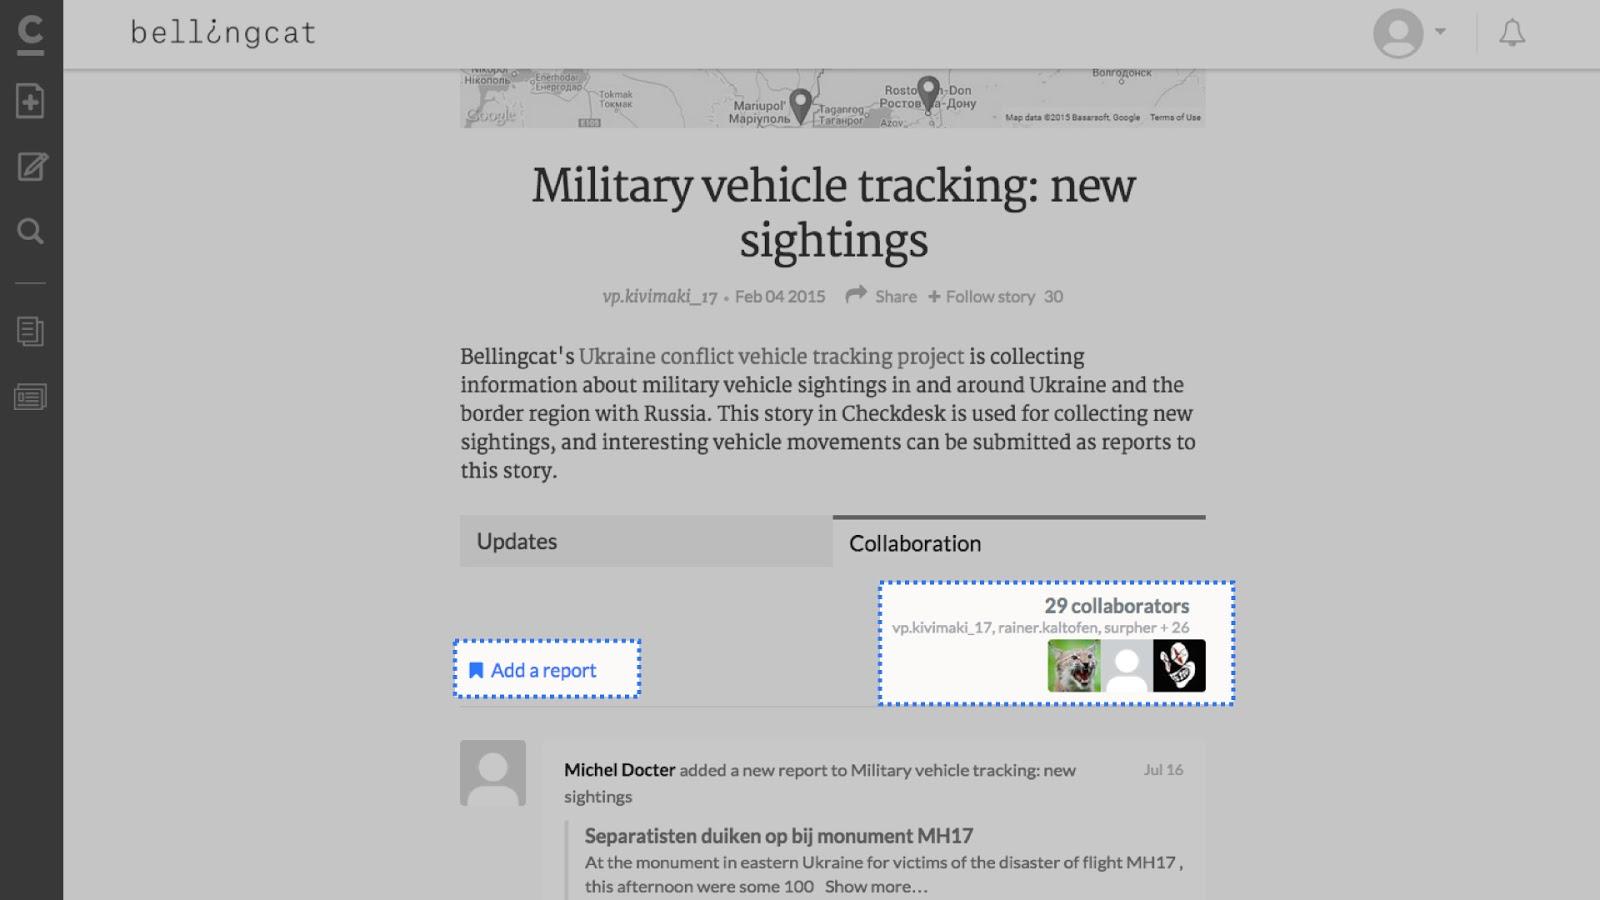 Checkdesk_Techraking_2015SEP.009 BOTH